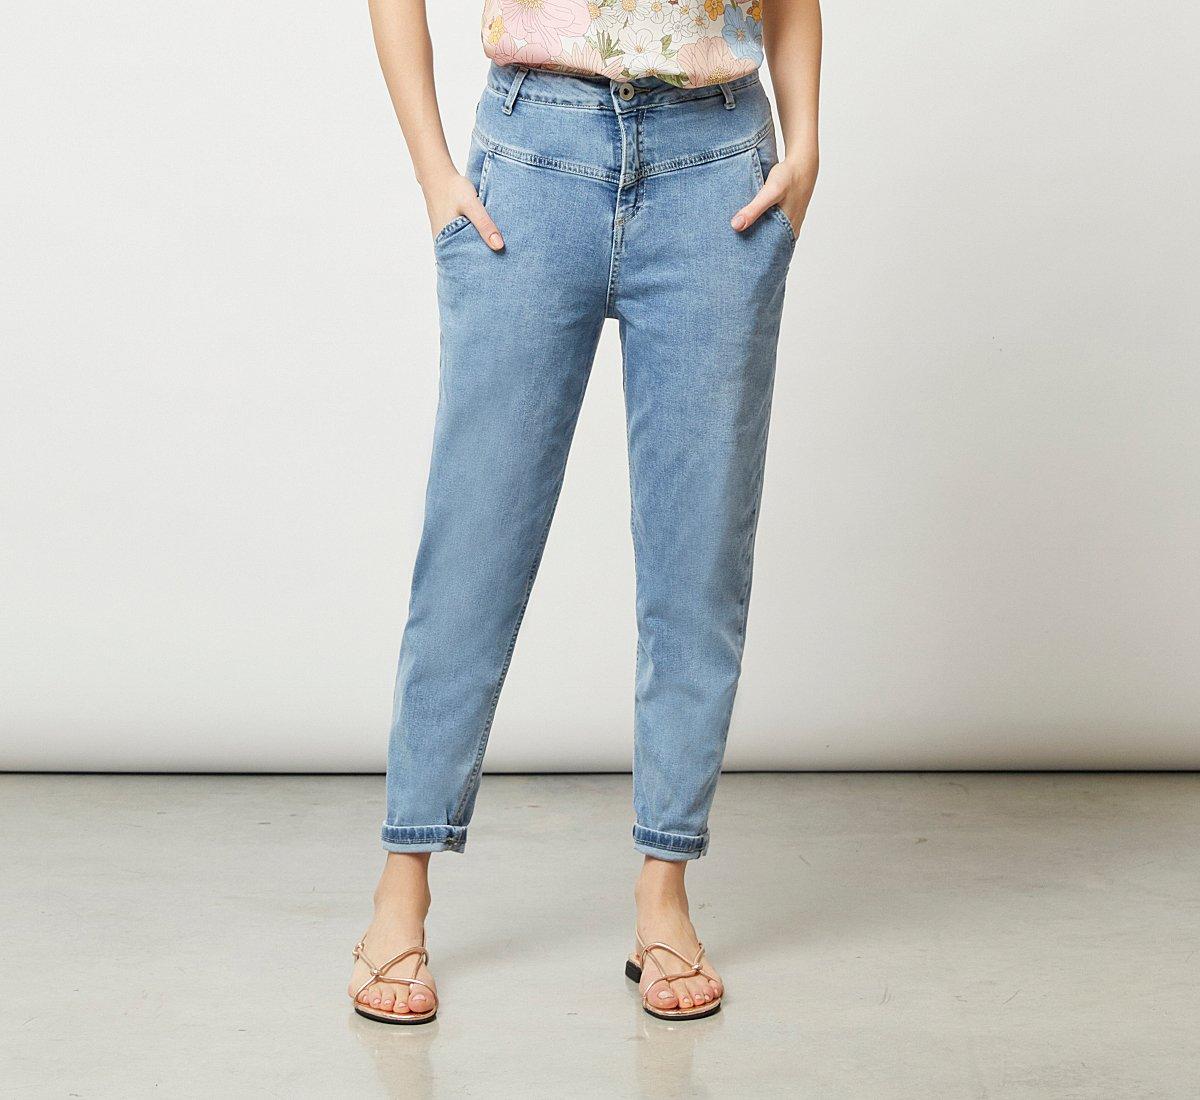 High-waisted jeans